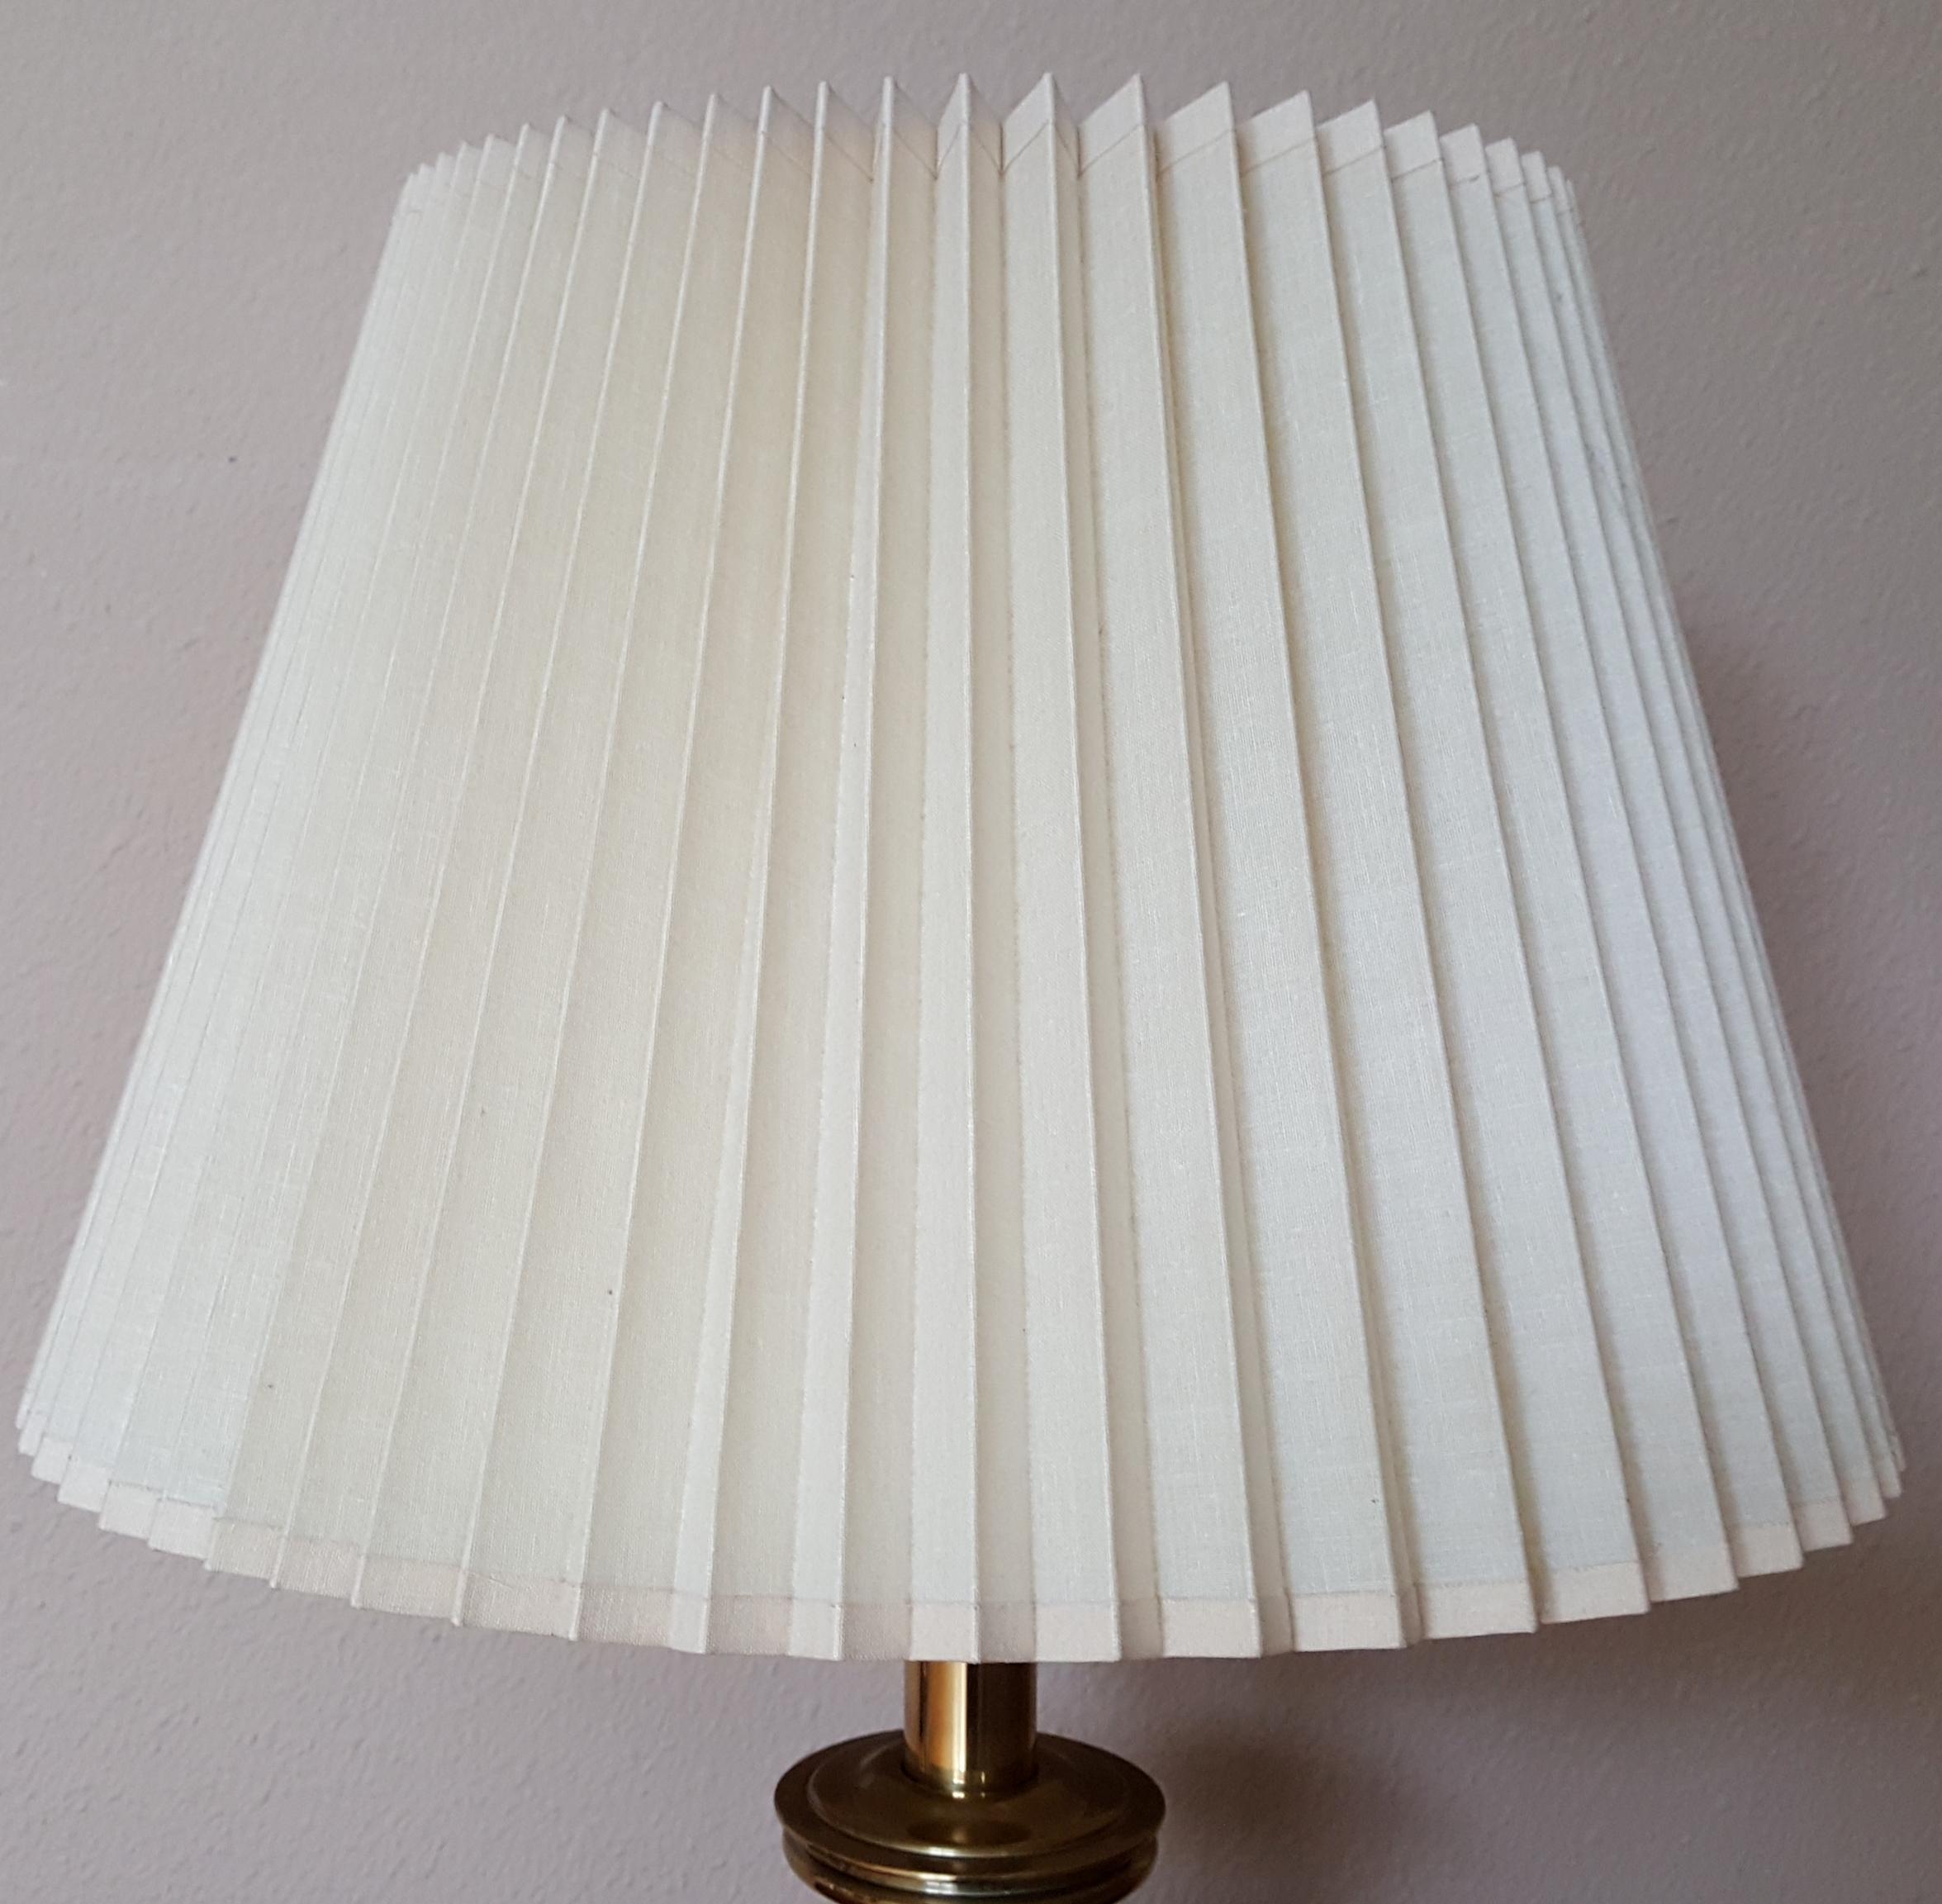 Hollywood Regency Style Stiffel Table Lamp